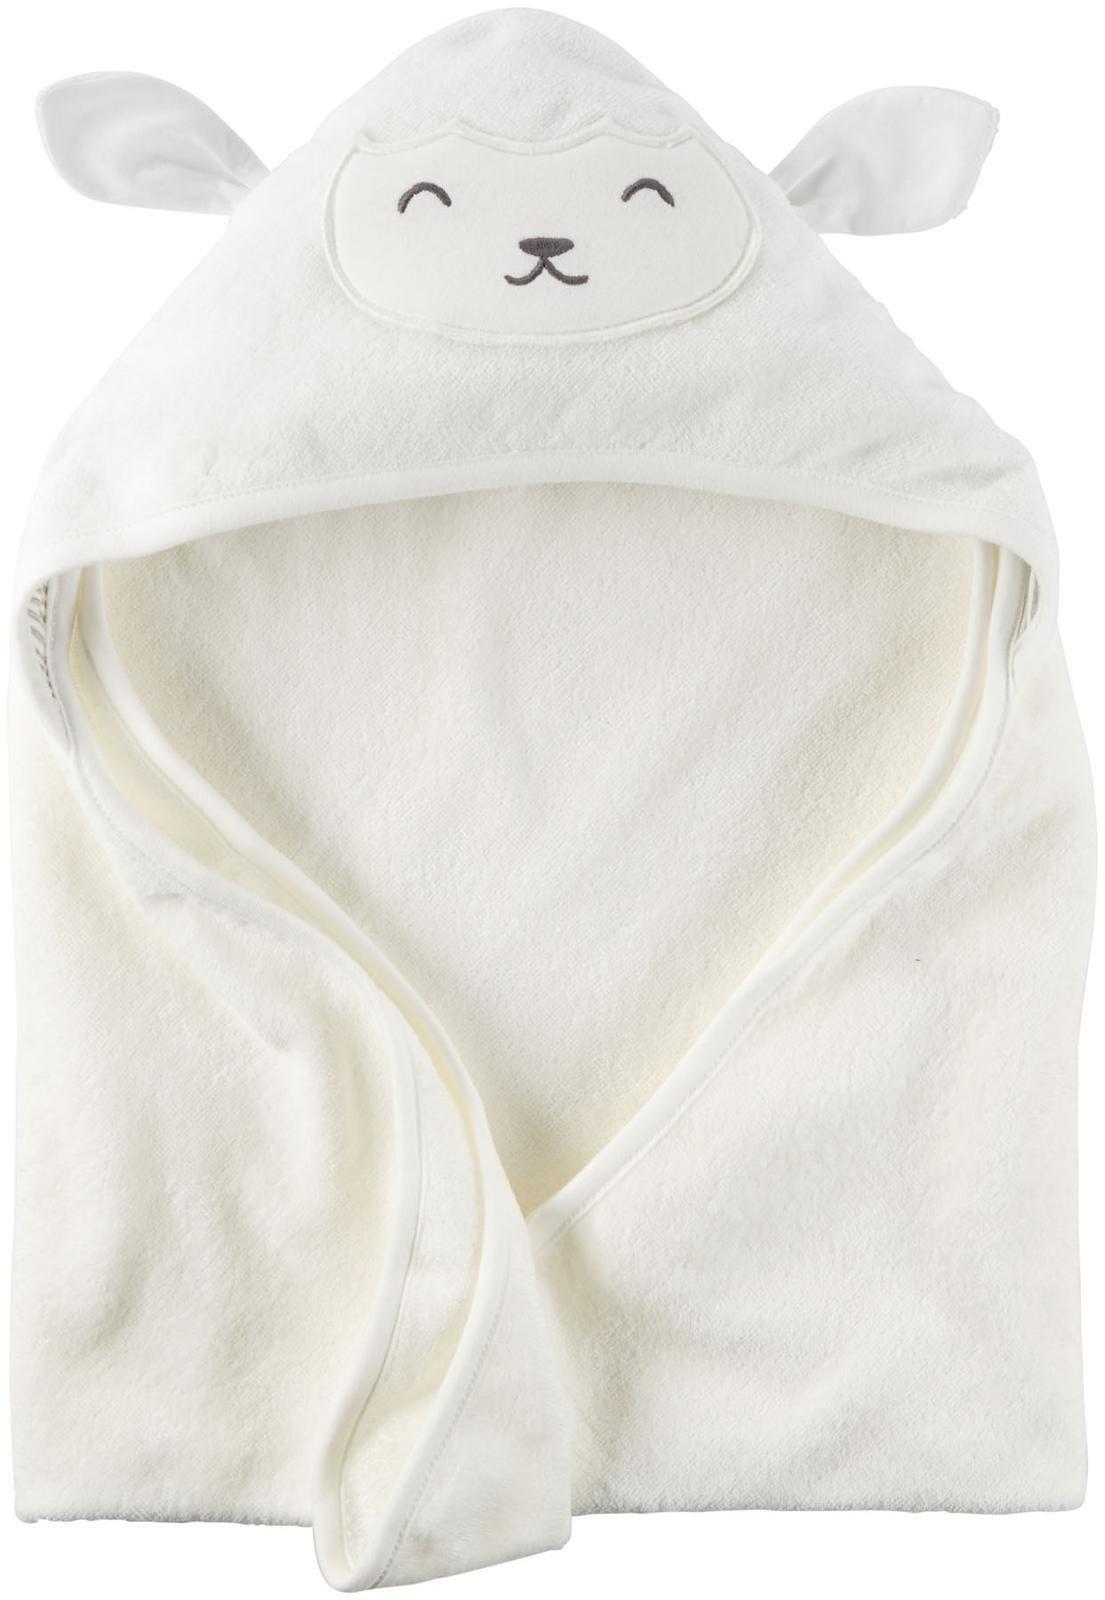 Carter's Hooded Bath Towel - Little Lamb - White